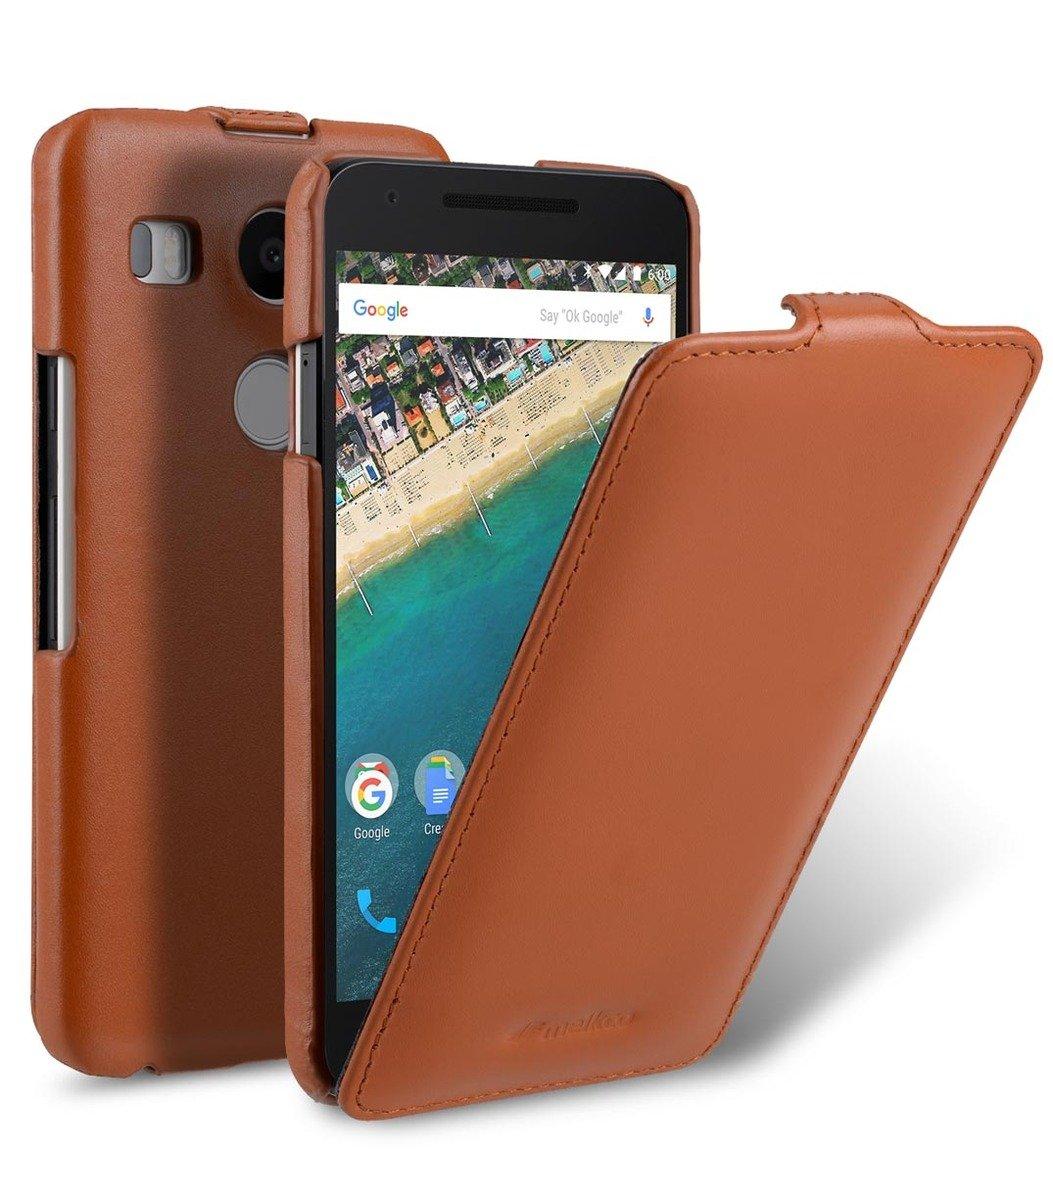 LG Nexus 5X Jacka Type高級真皮手機皮套-瘋馬啡色